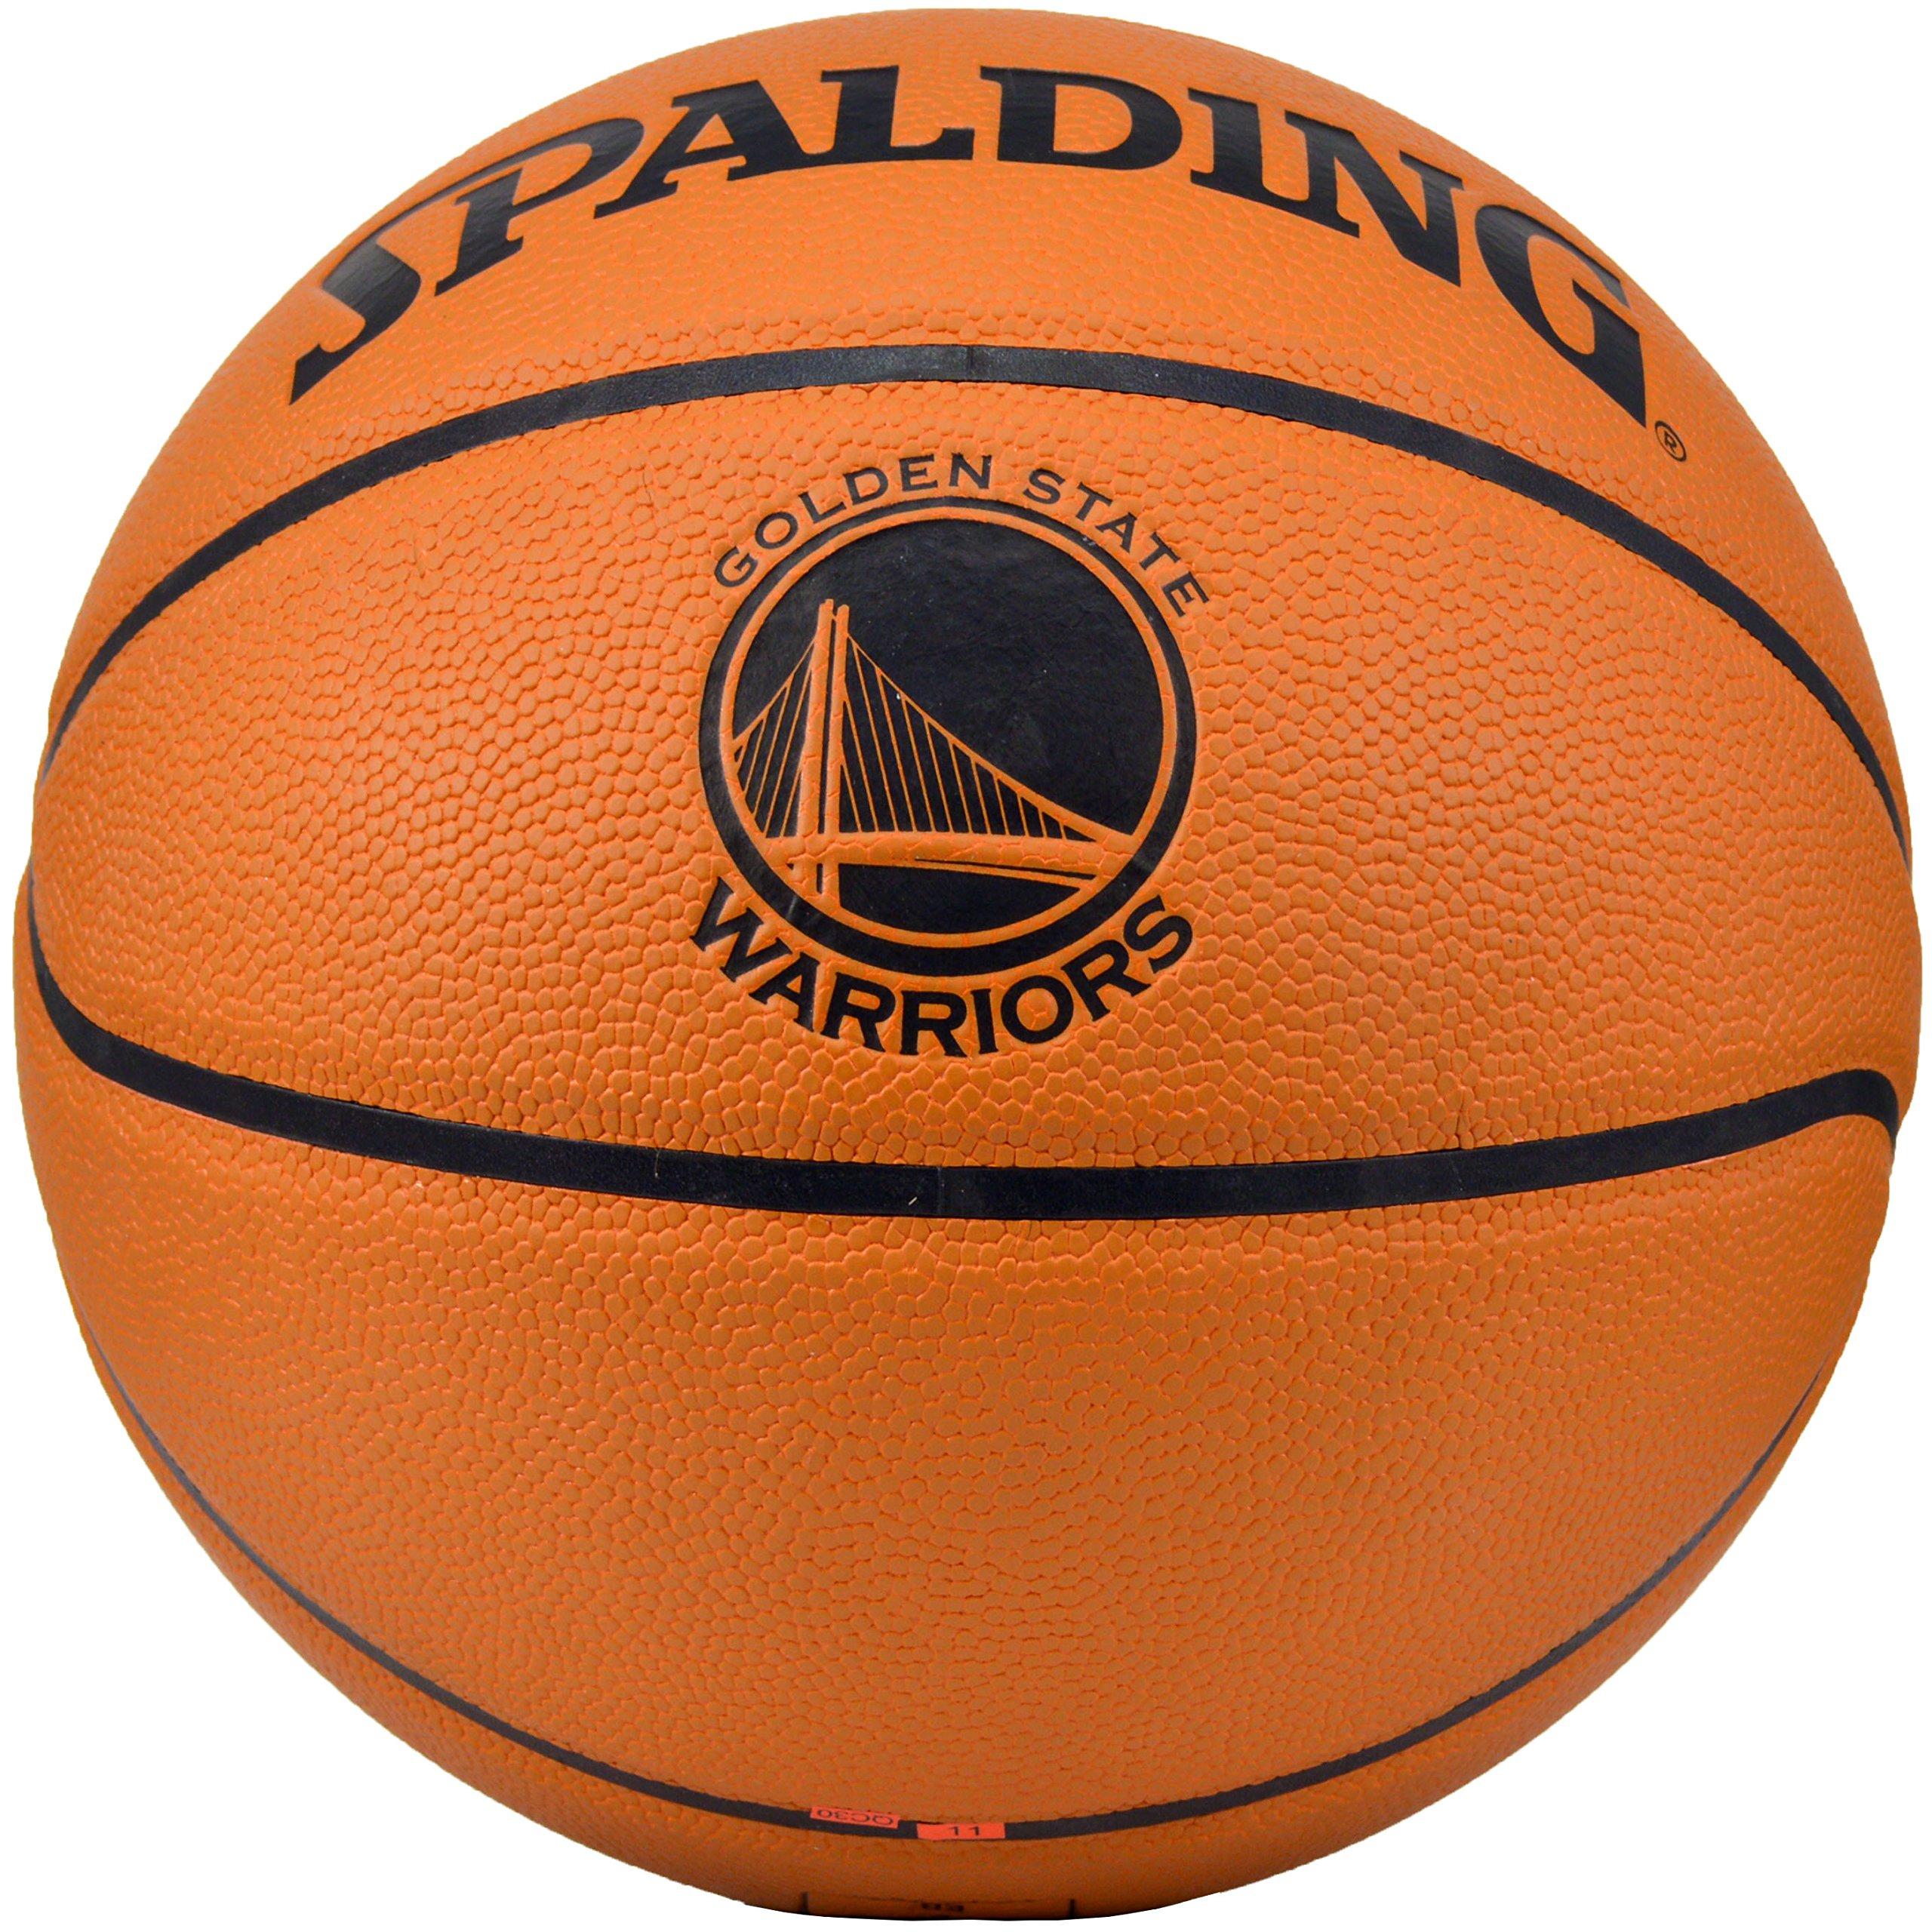 Spalding NBA Golden State Warriors Team Logo Composite Leather Basketball